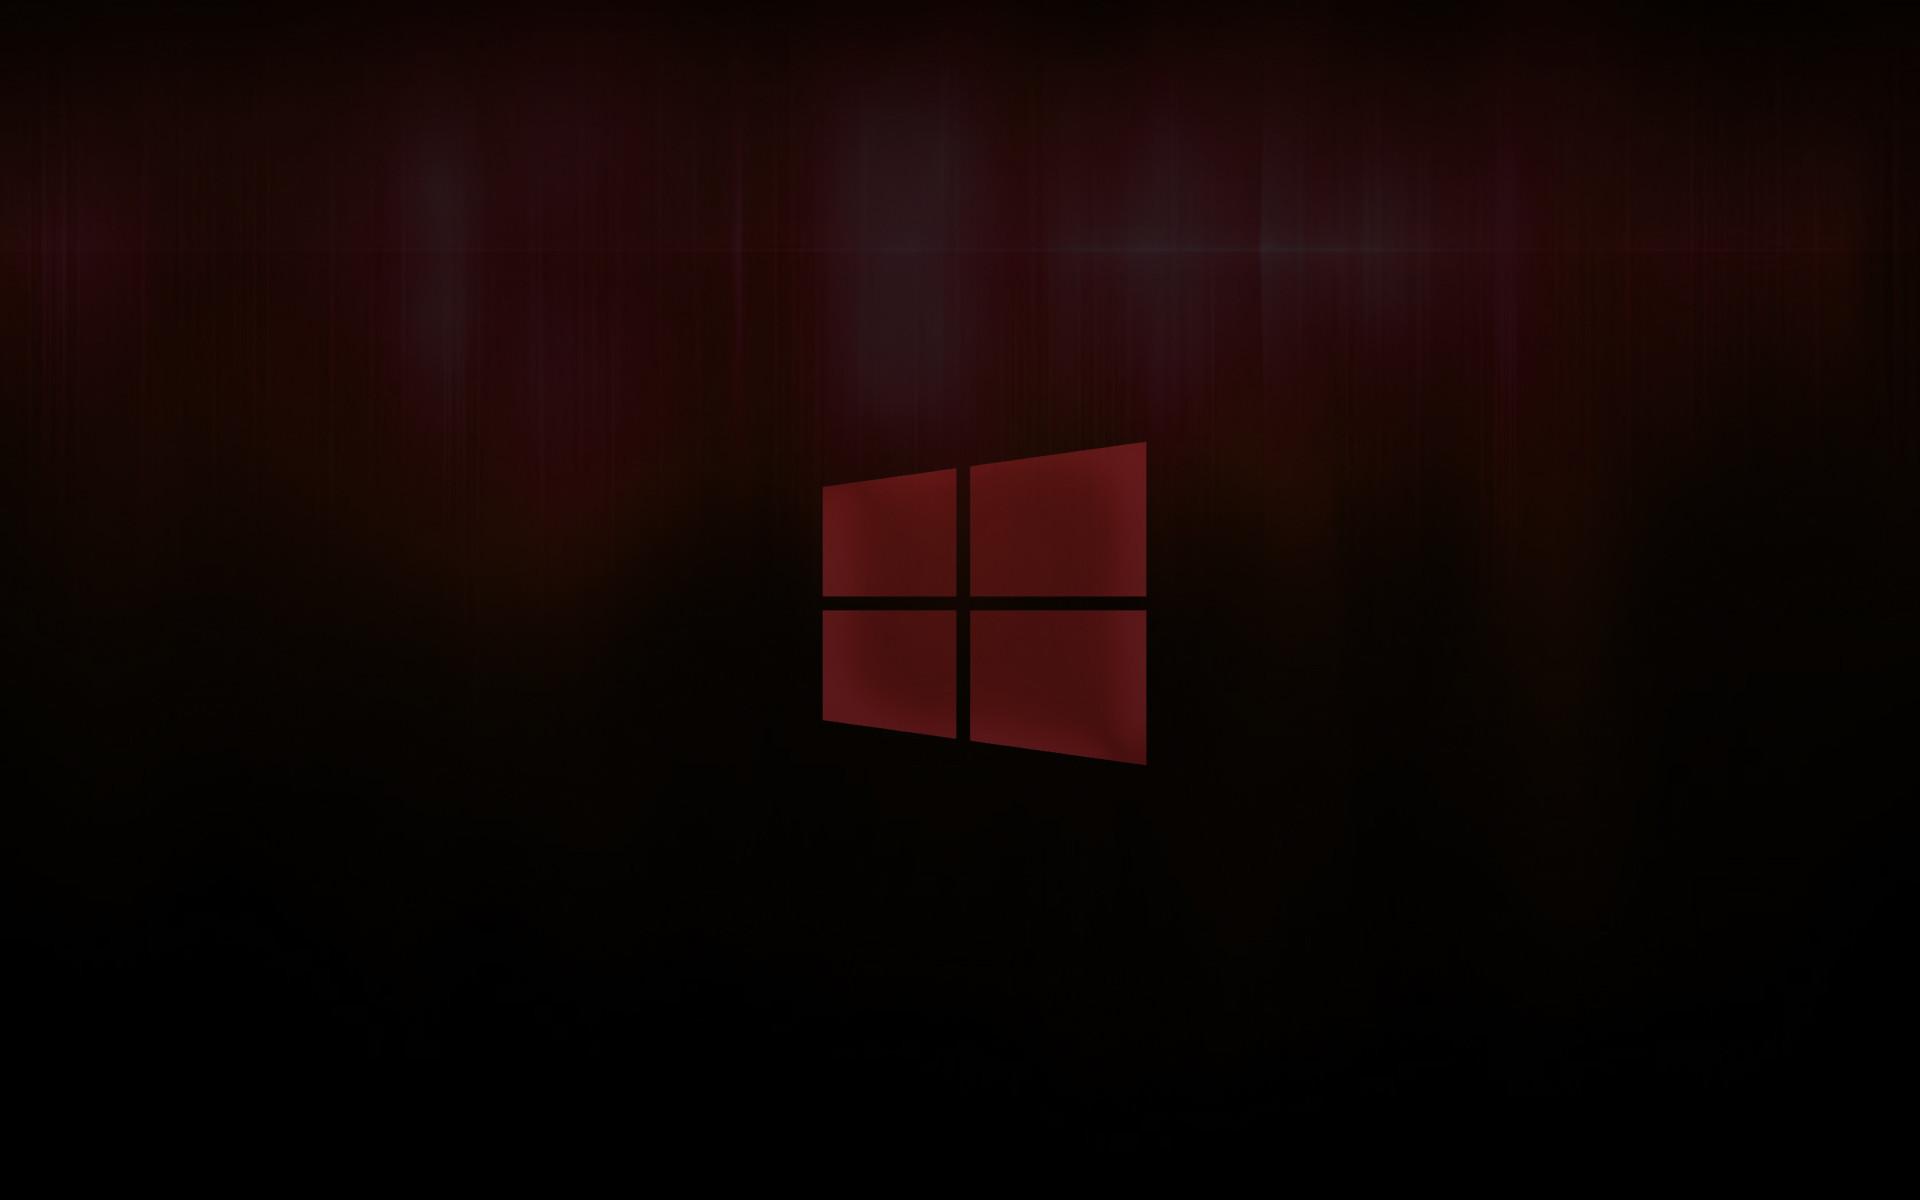 Windows 10 wallpaper that I made [1920 X 1200].